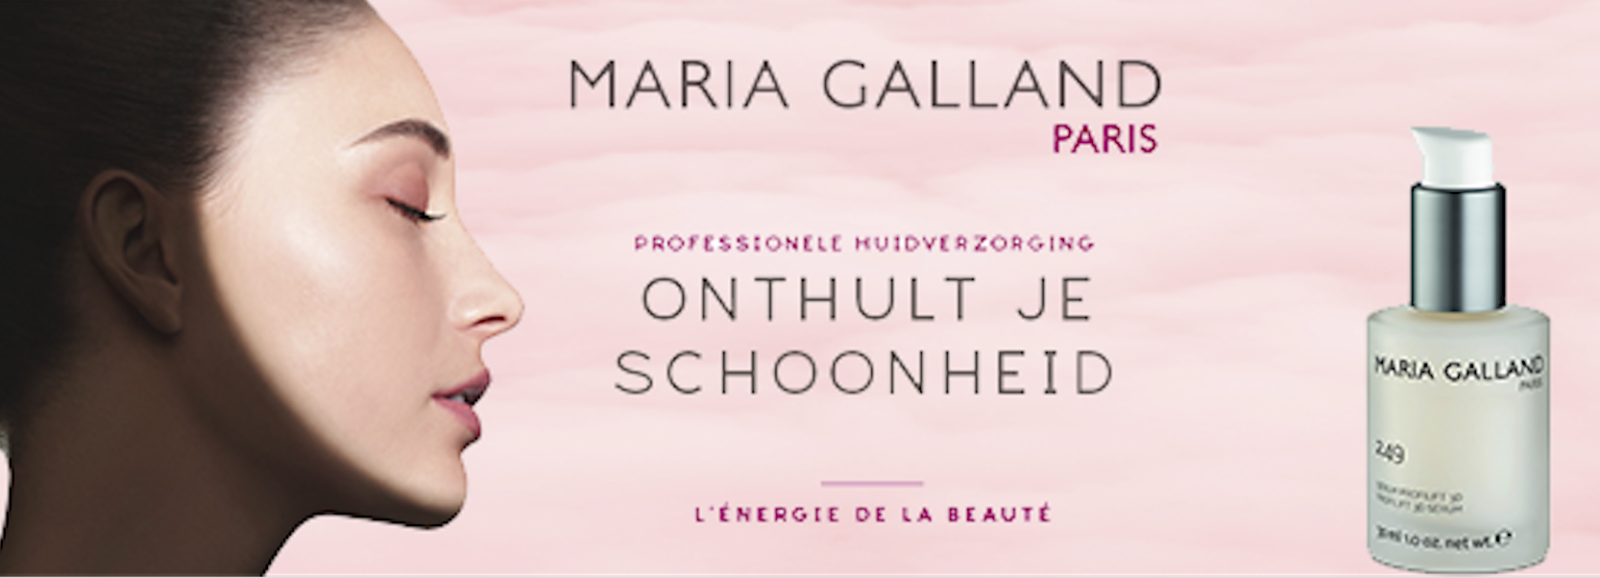 Maria Galland Onthult je schoonheid